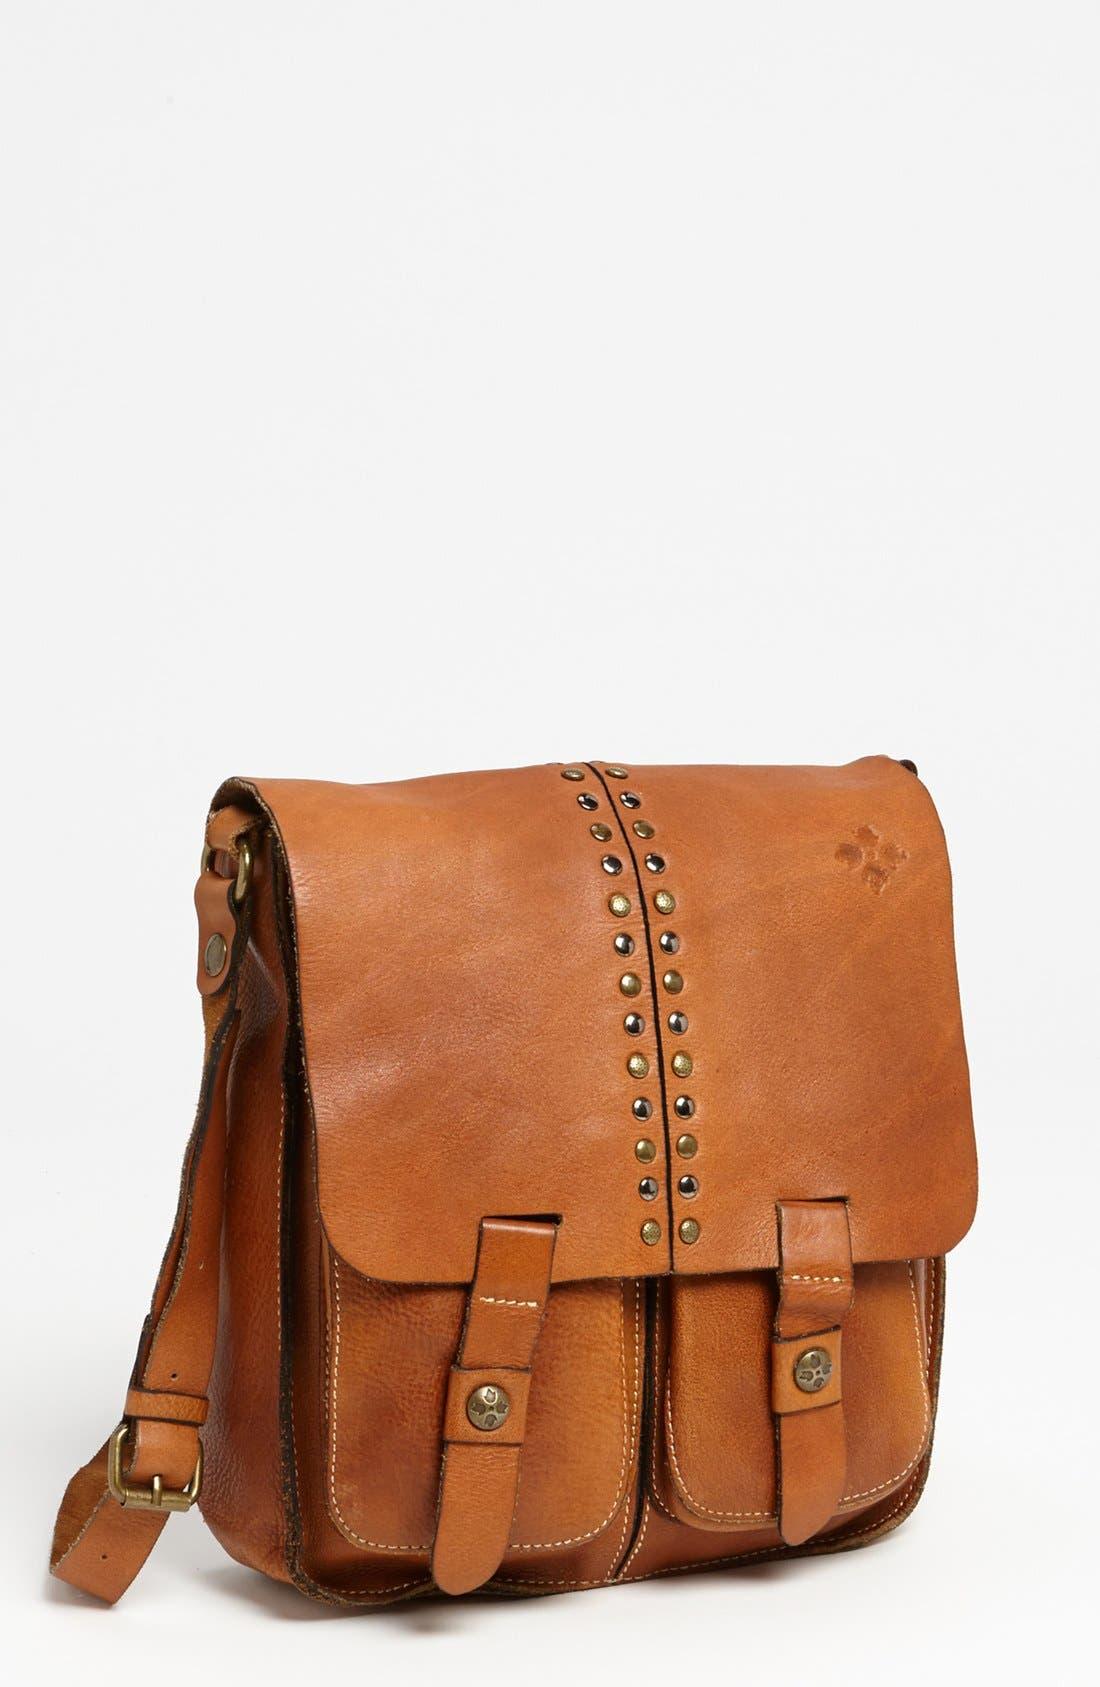 Alternate Image 1 Selected - Patricia Nash 'Armeno' Leather Messenger Bag